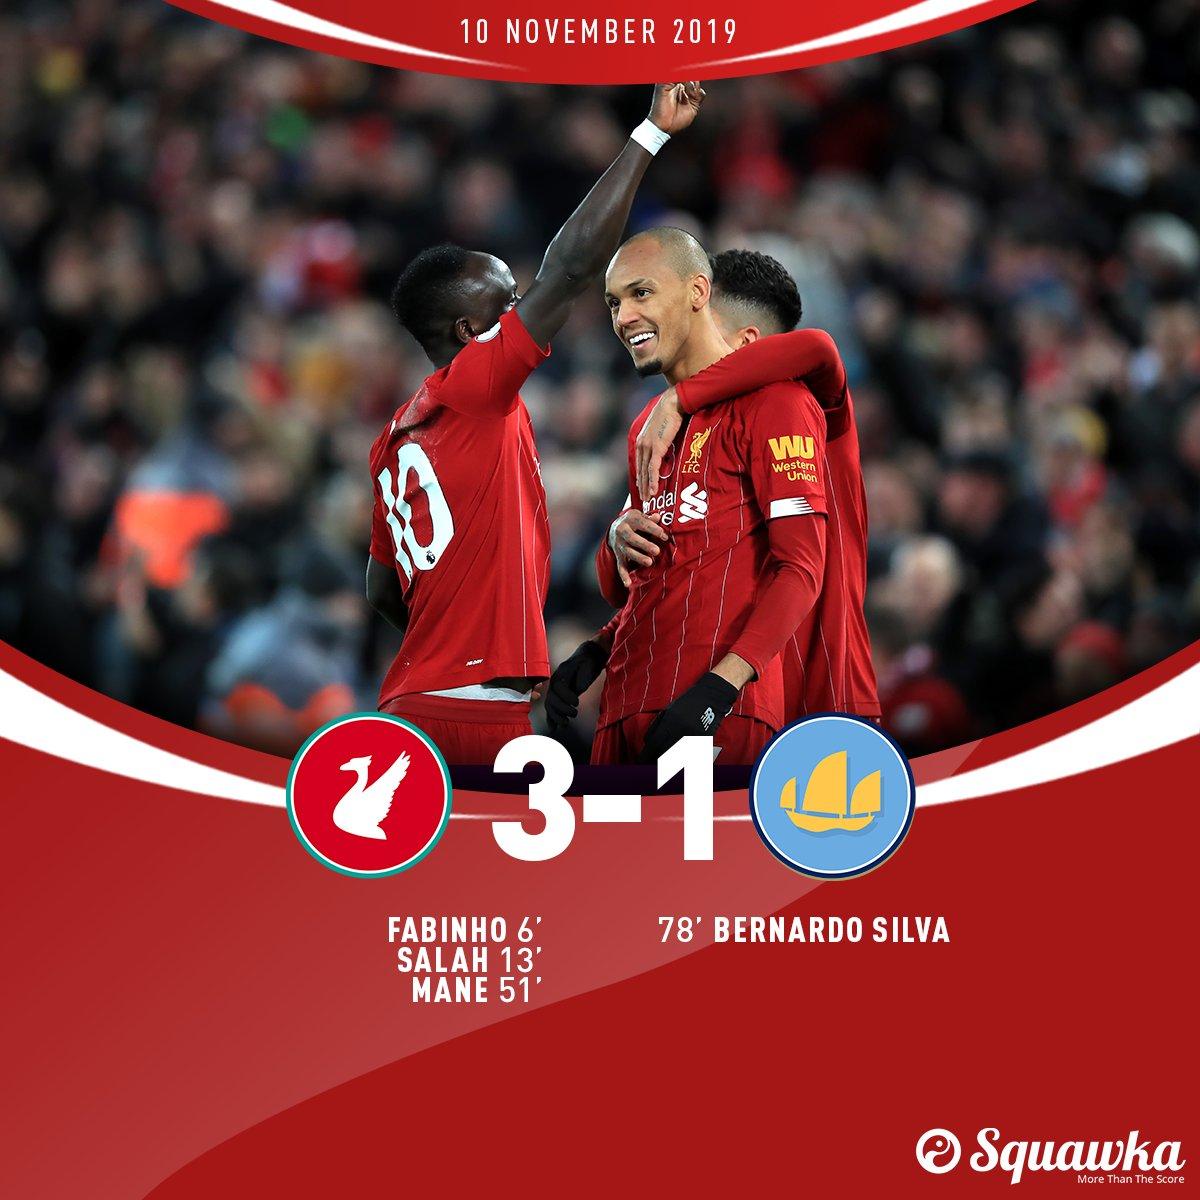 Liverpool 3-1 Man City FT: ⚽️ Fabinho ⚽️ Salah ⚽️ Mané ⚽️ Bernardo Silva Jürgen Klopps side go nine points clear of Man City with an emphatic win at Anfield.